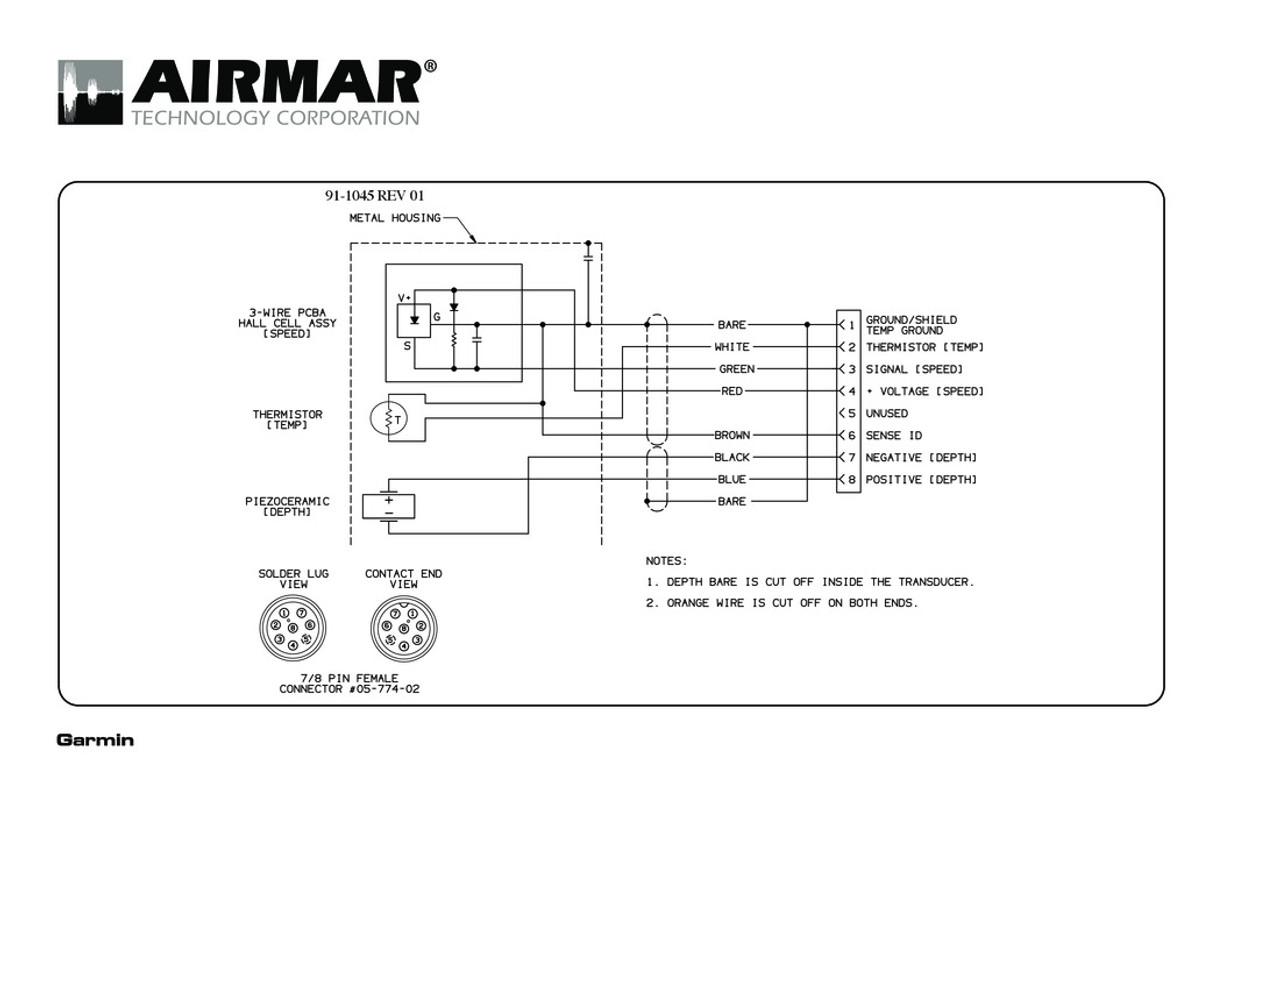 Diagram For Wiring 8 Pin Nr 51 - good #1st wiring diagram